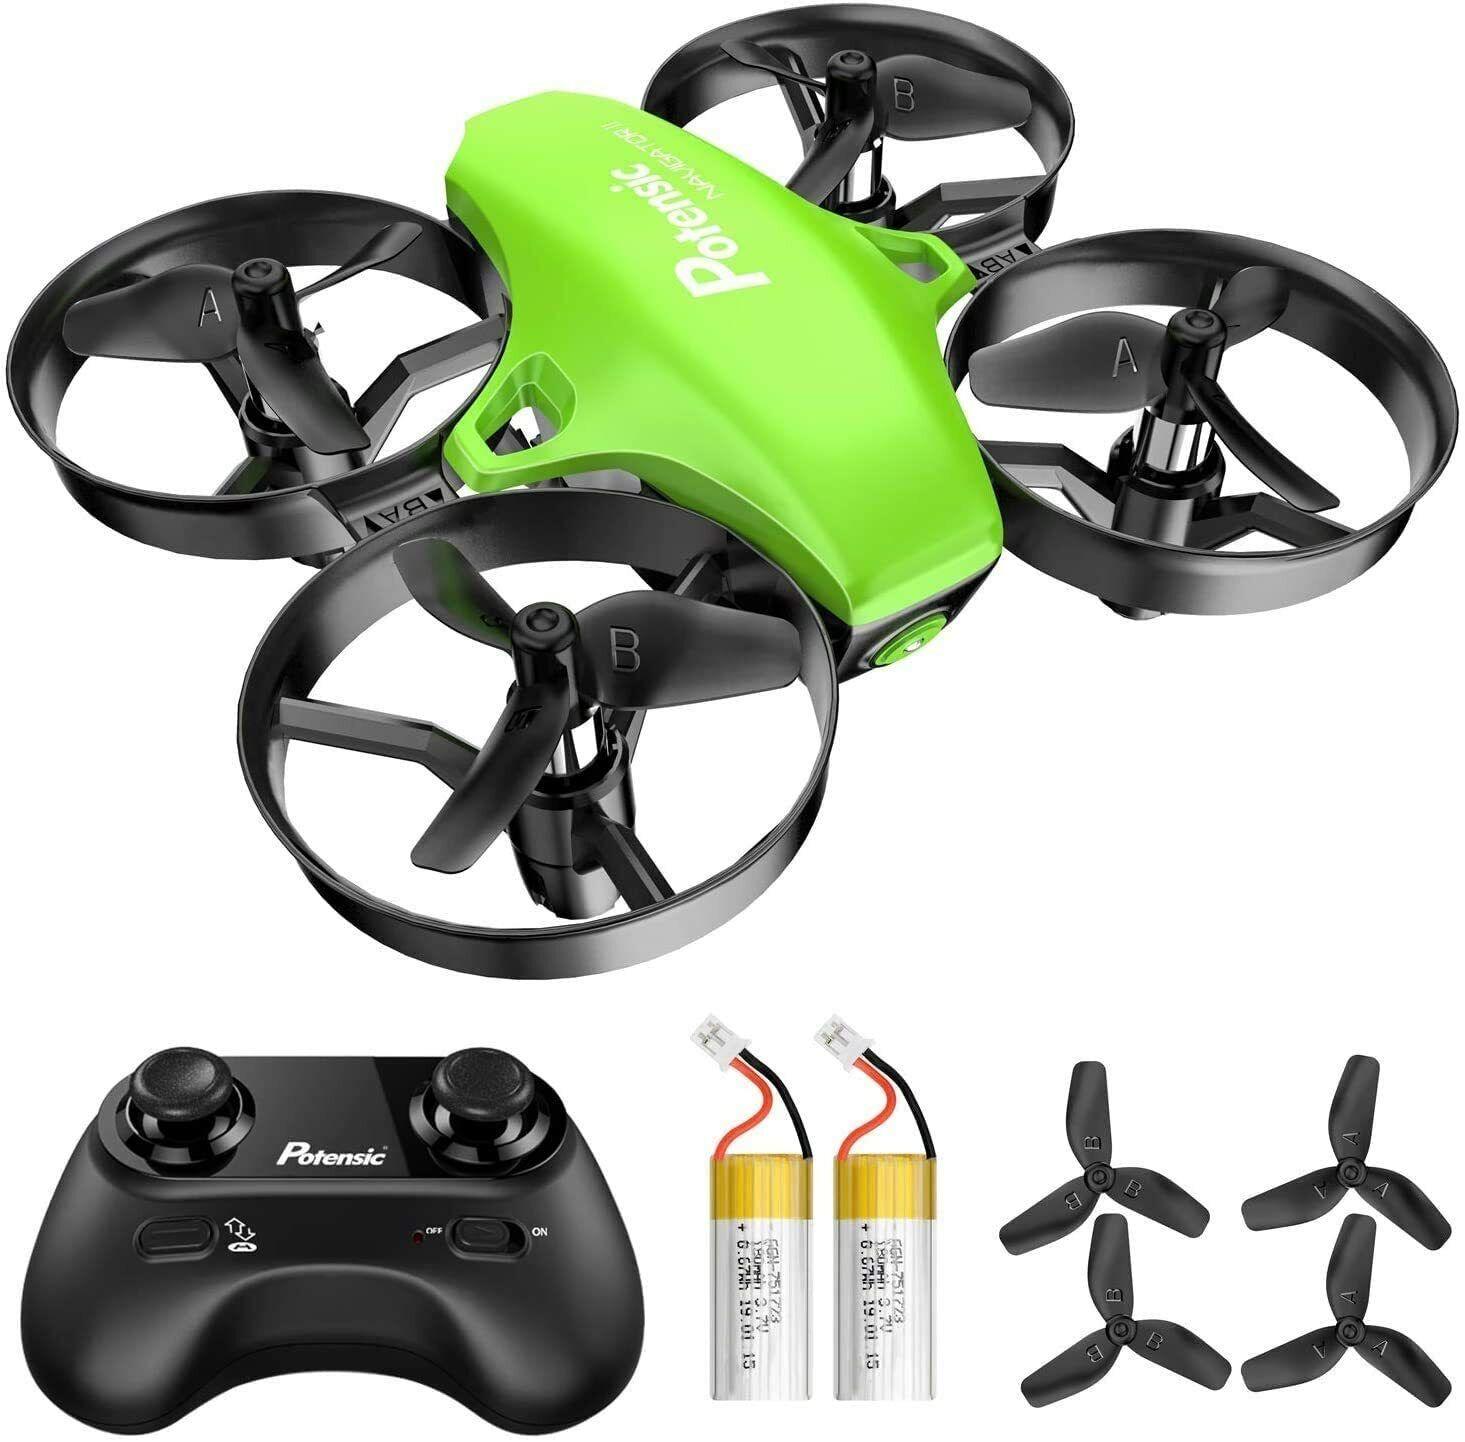 Potensic A20 Mini Drohne 2.4G RC Quadrocopter Spielzeug Helikopter für Kinder